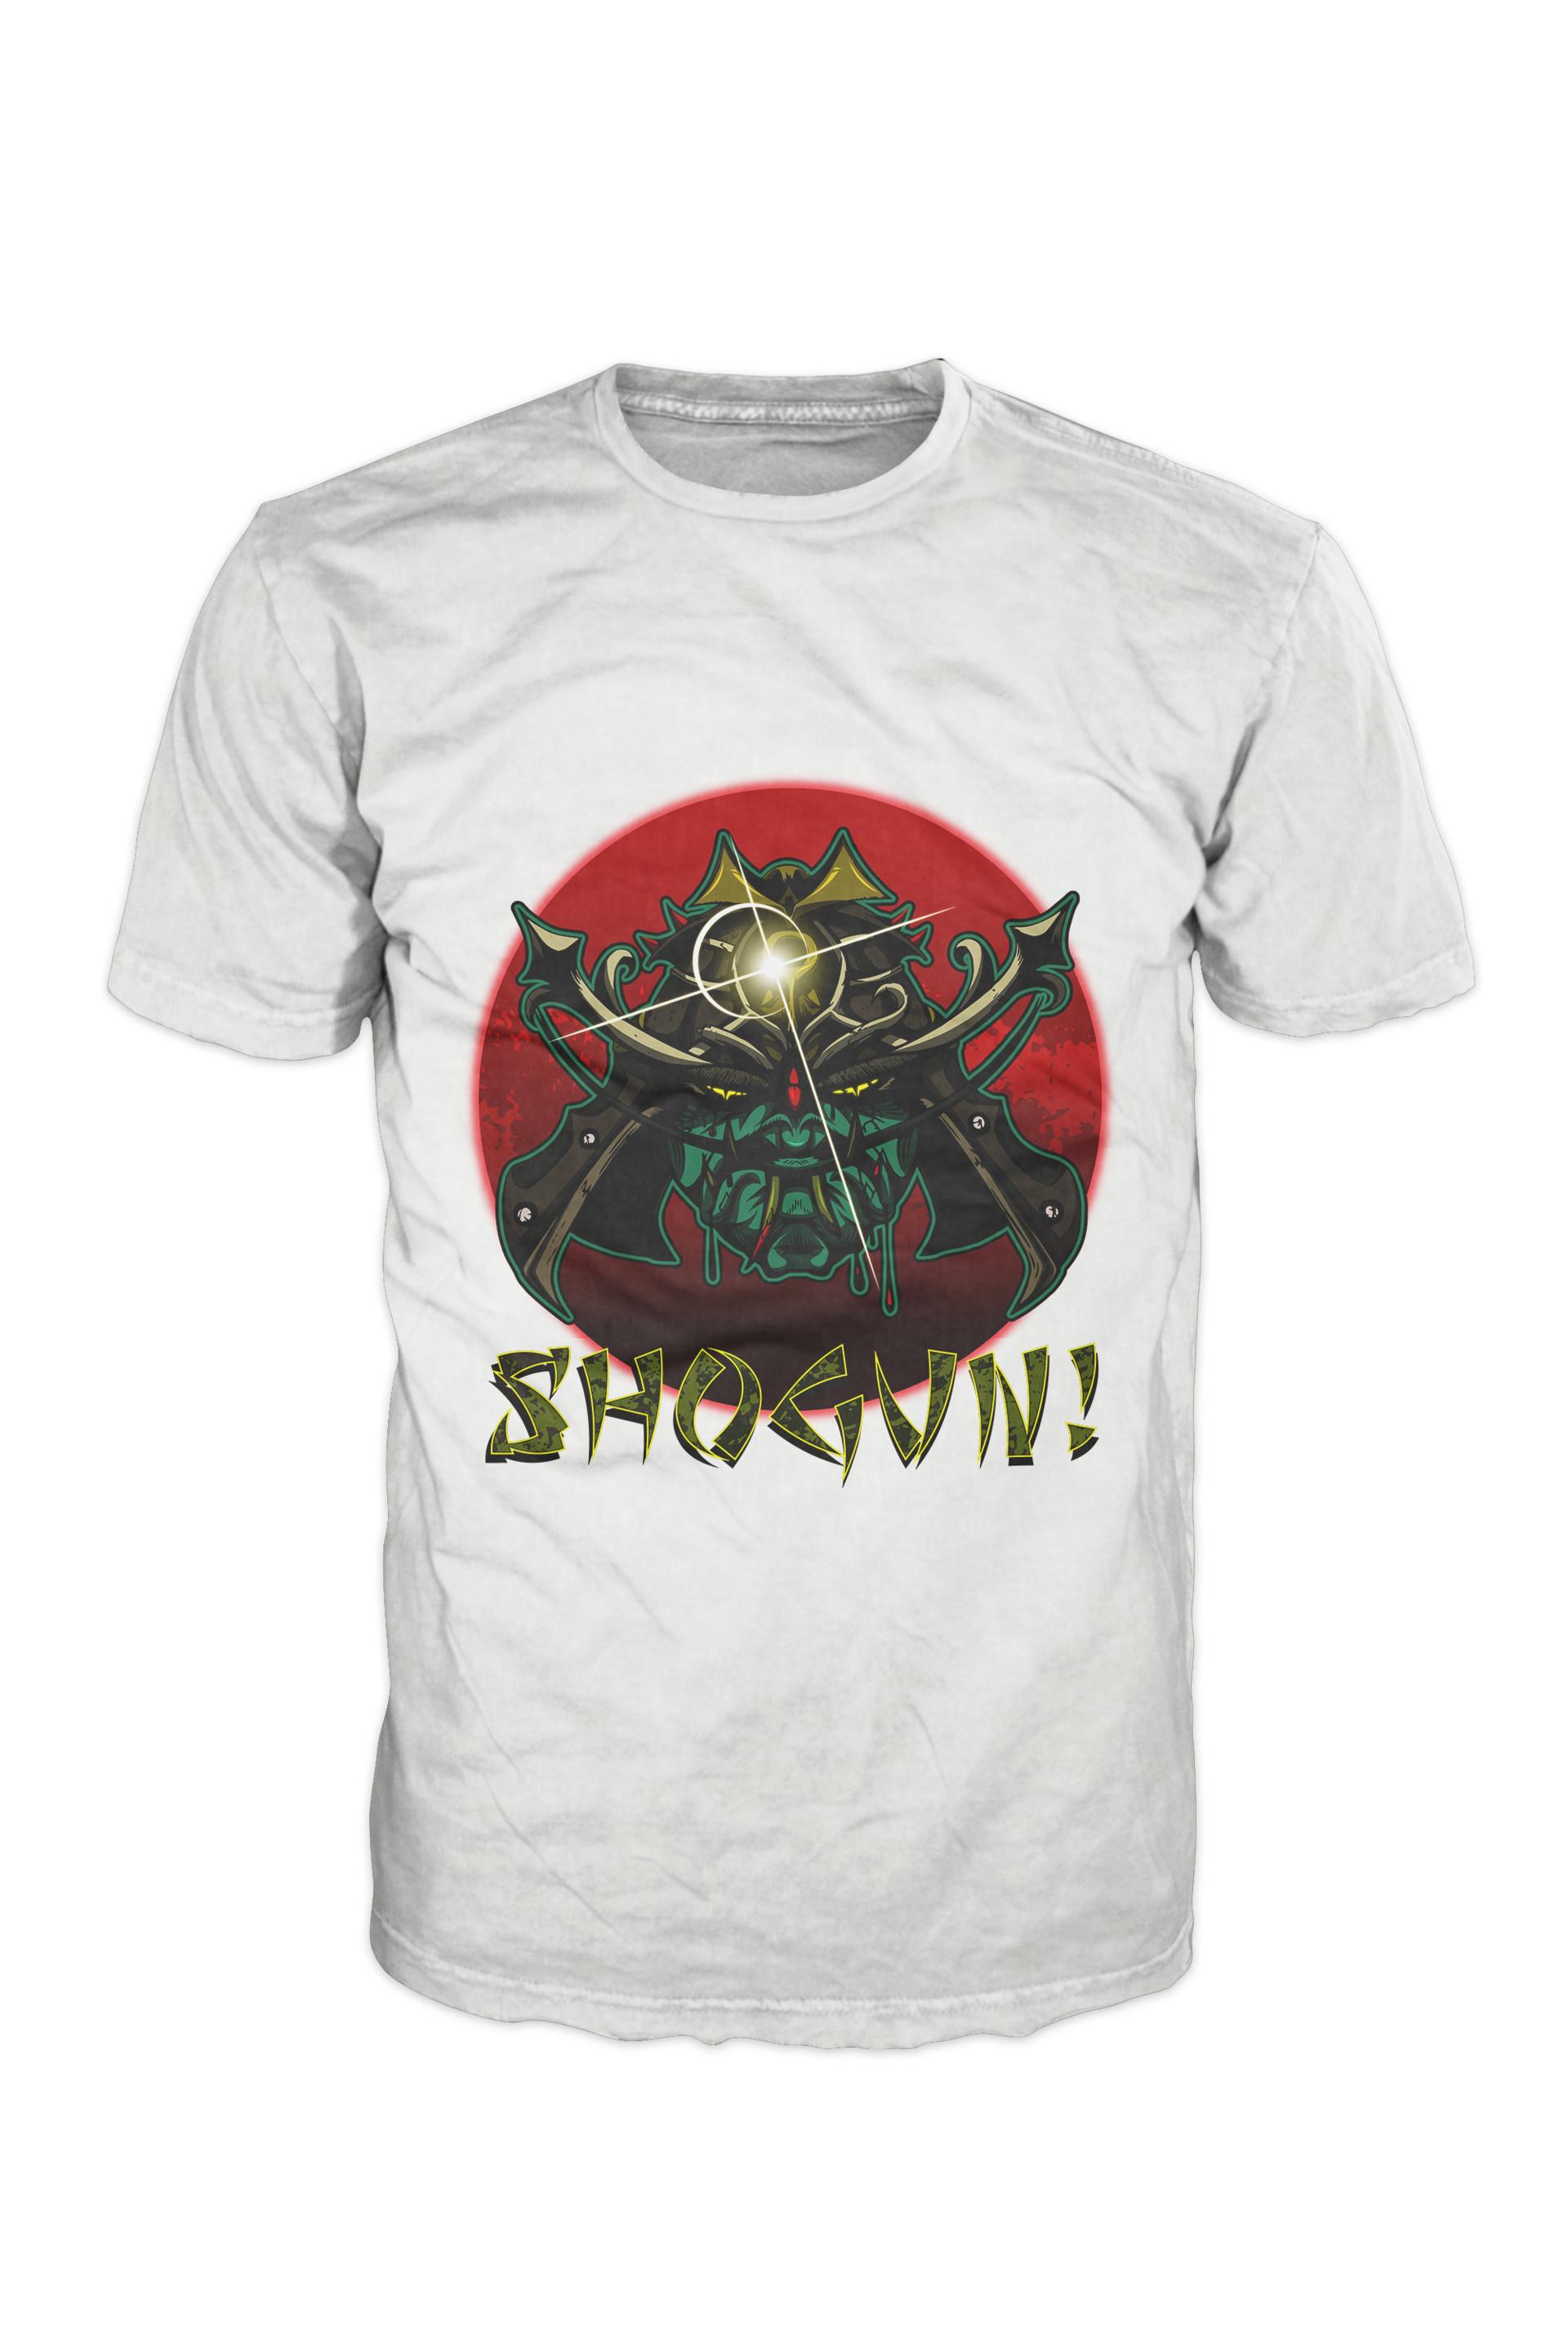 Nathaniel scramling shogun shirt